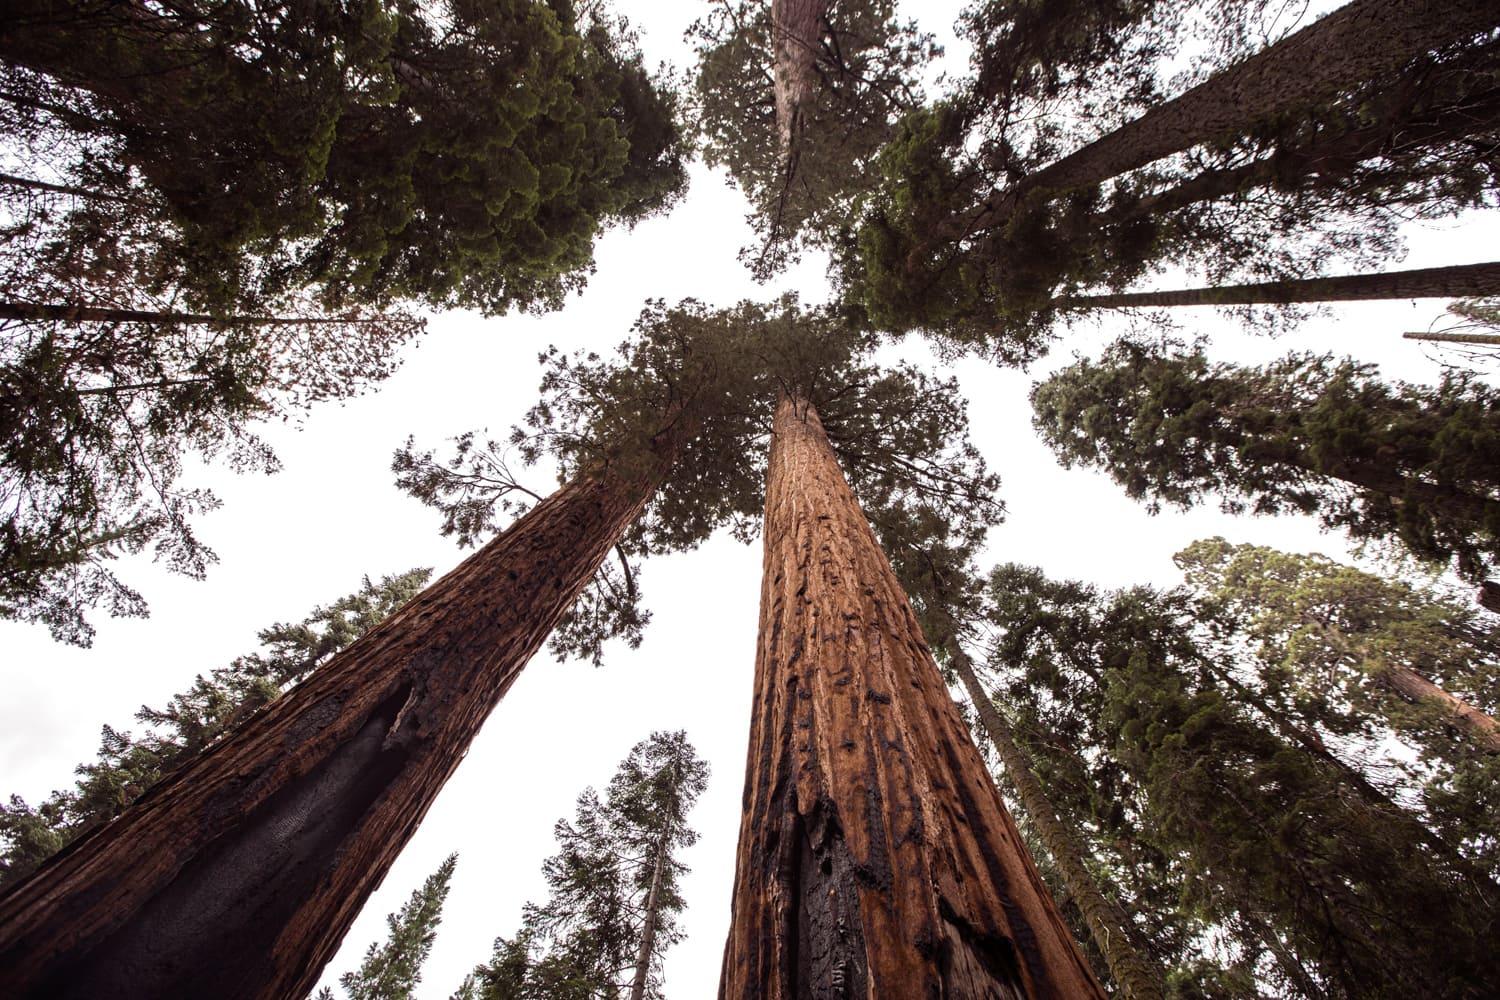 Sequoia trees in Sequoia National Park.